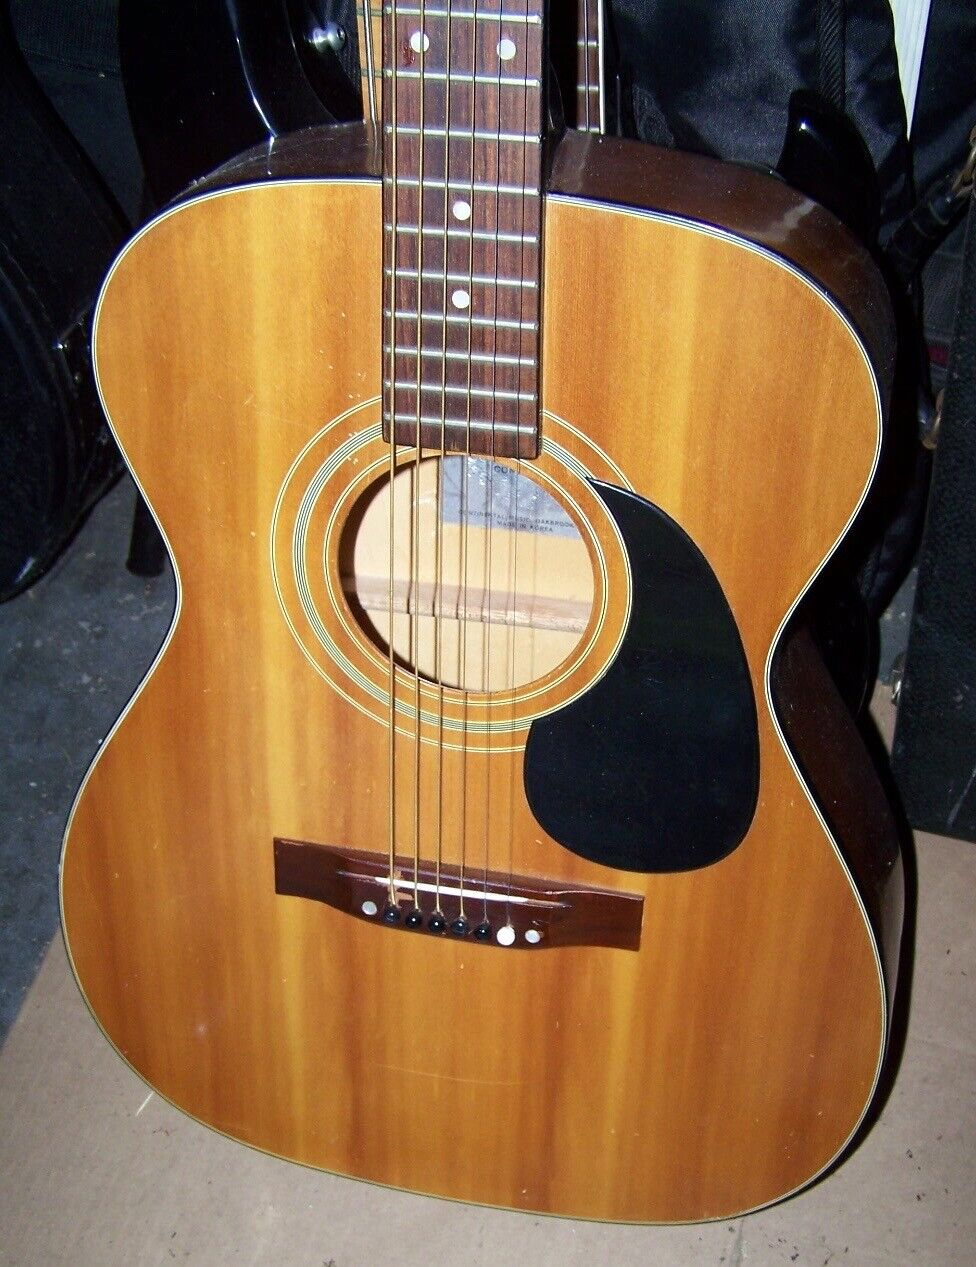 s l1600 - 1970's Continental Drifter DF-150 Acoustic Guitar